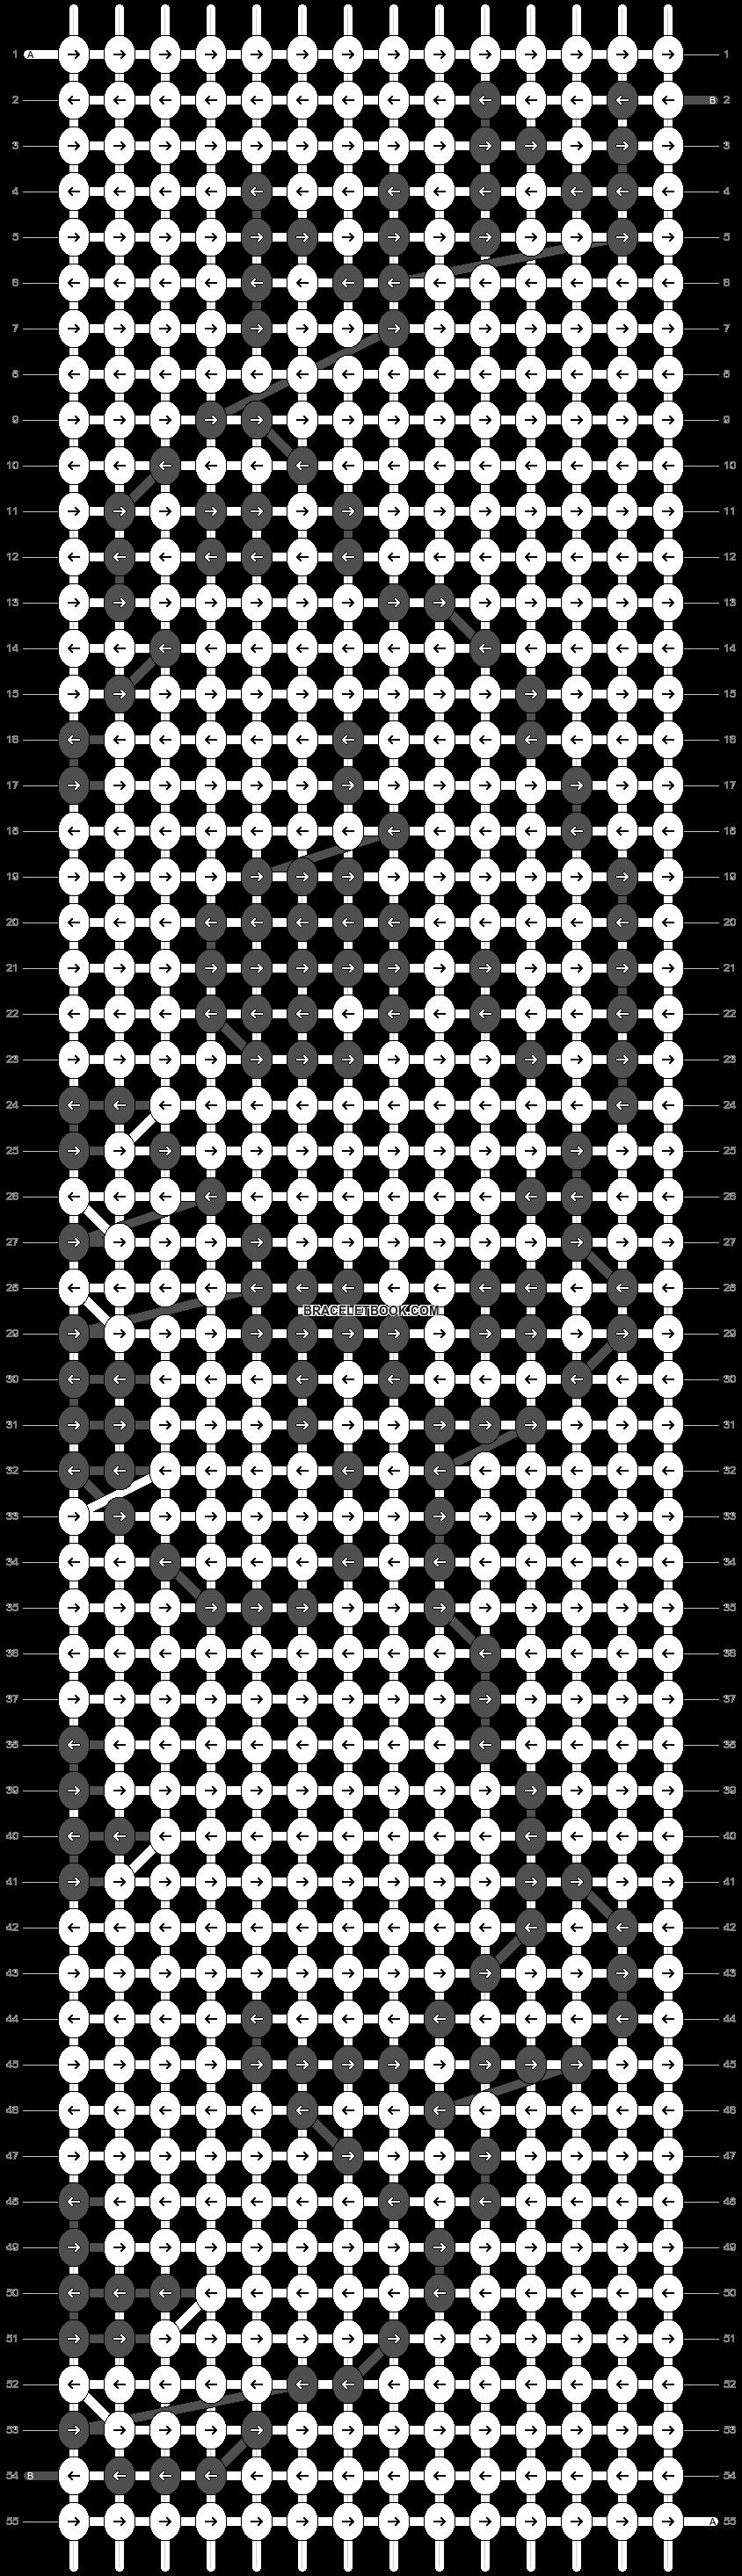 Alpha pattern #14472 pattern